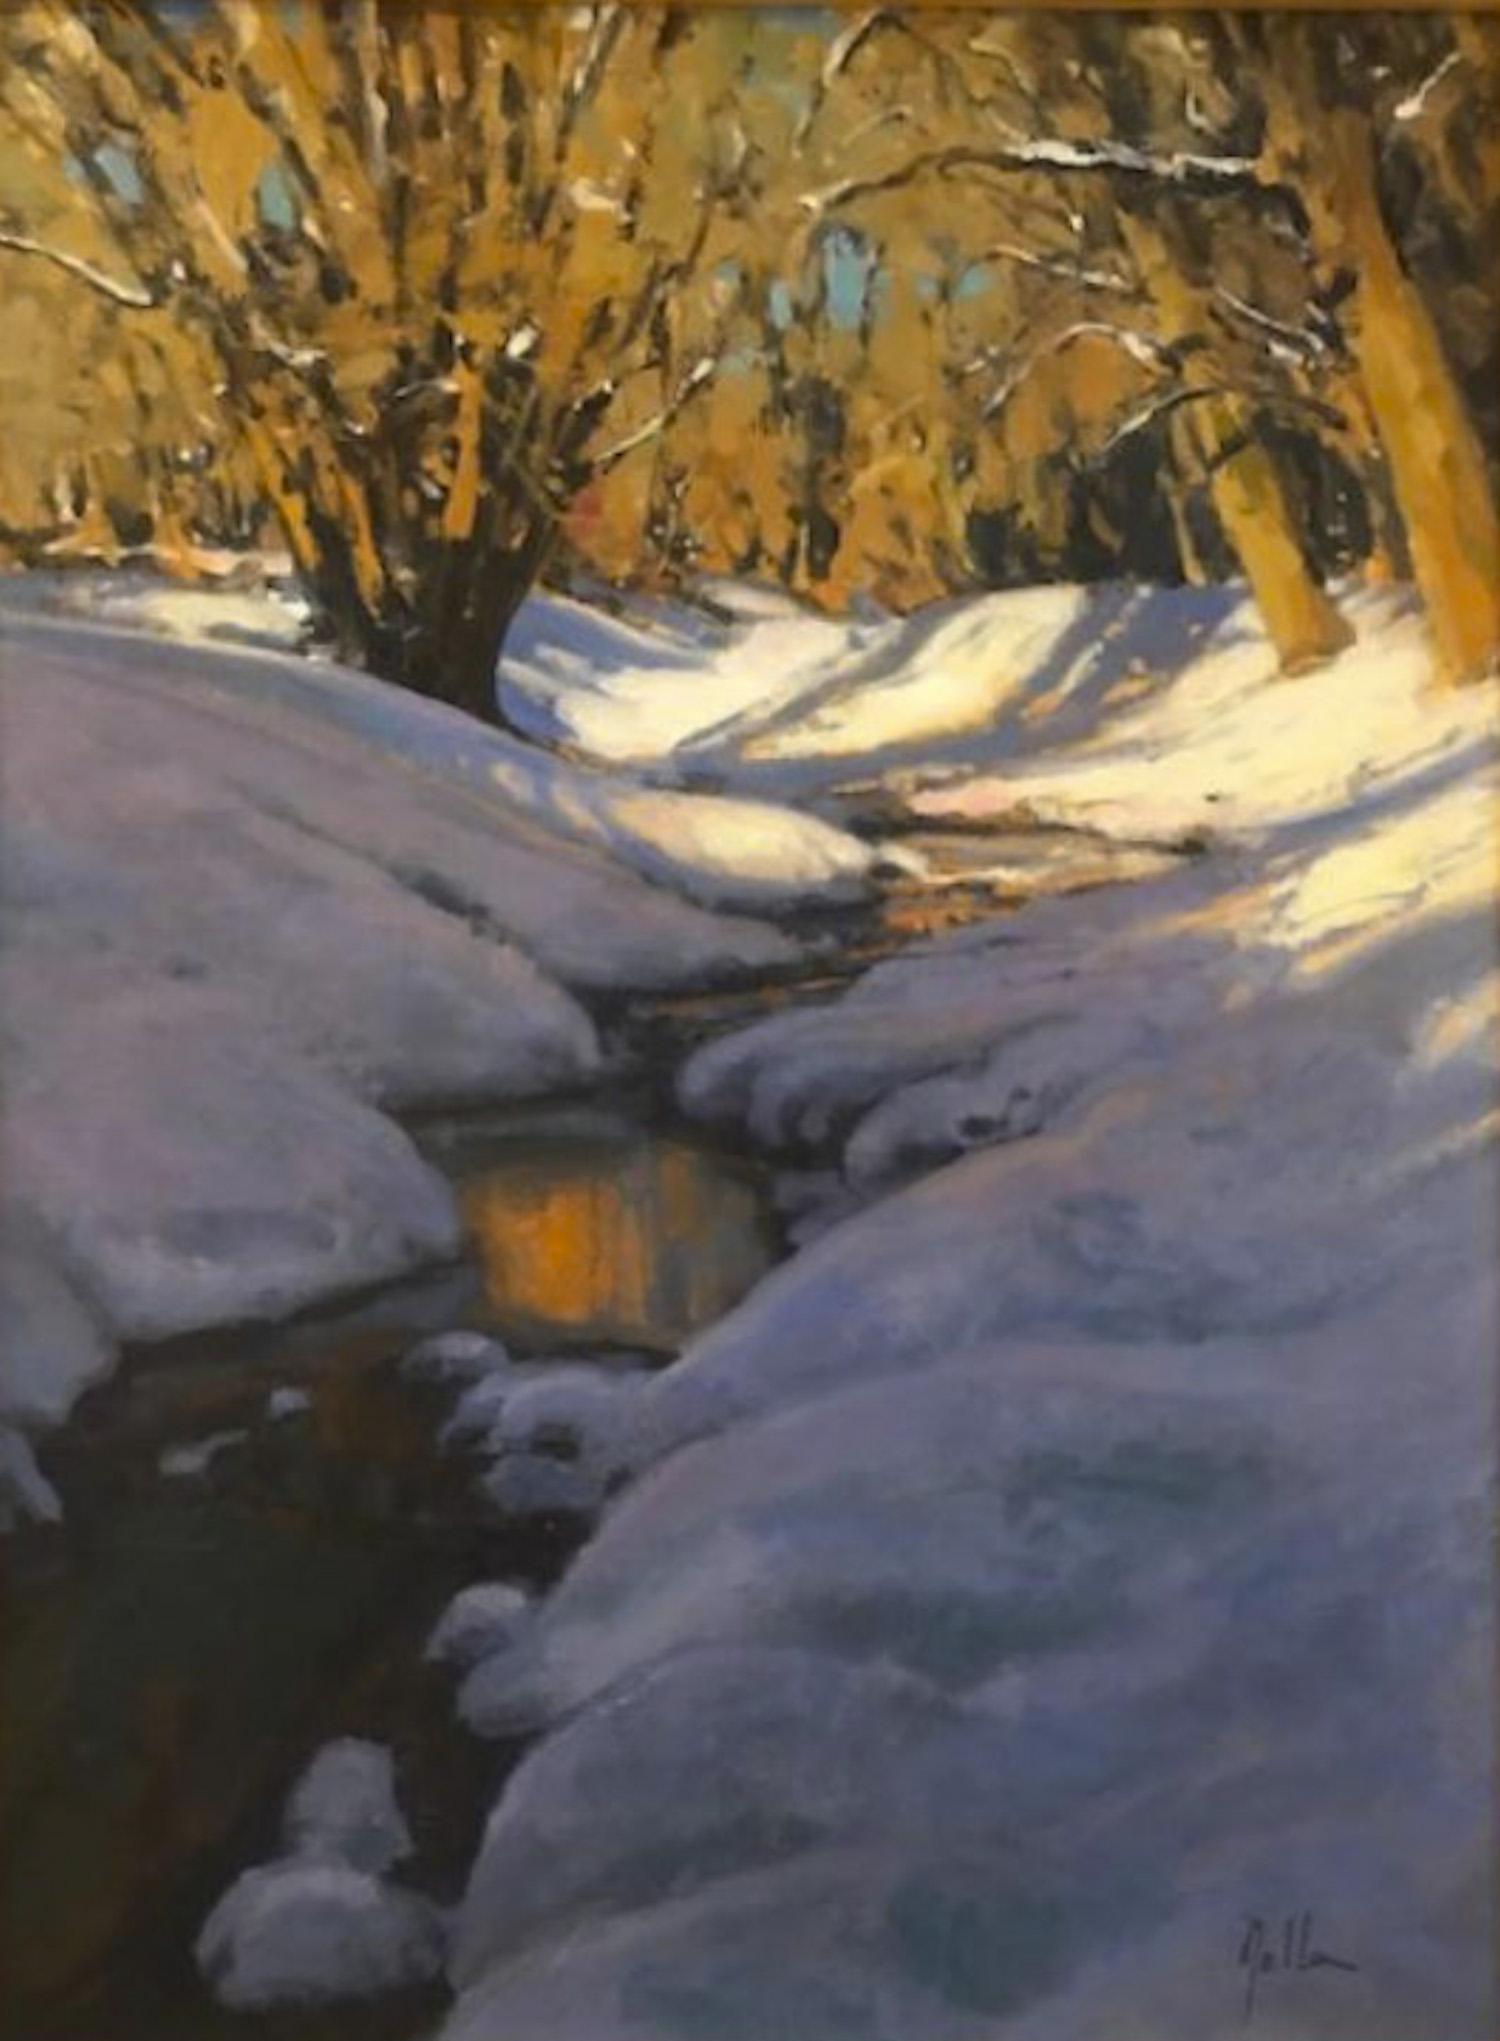 """Glow"" | 24"" x 18"" | Original Oil Painting | $3,250.00 | By Bill Gallen"